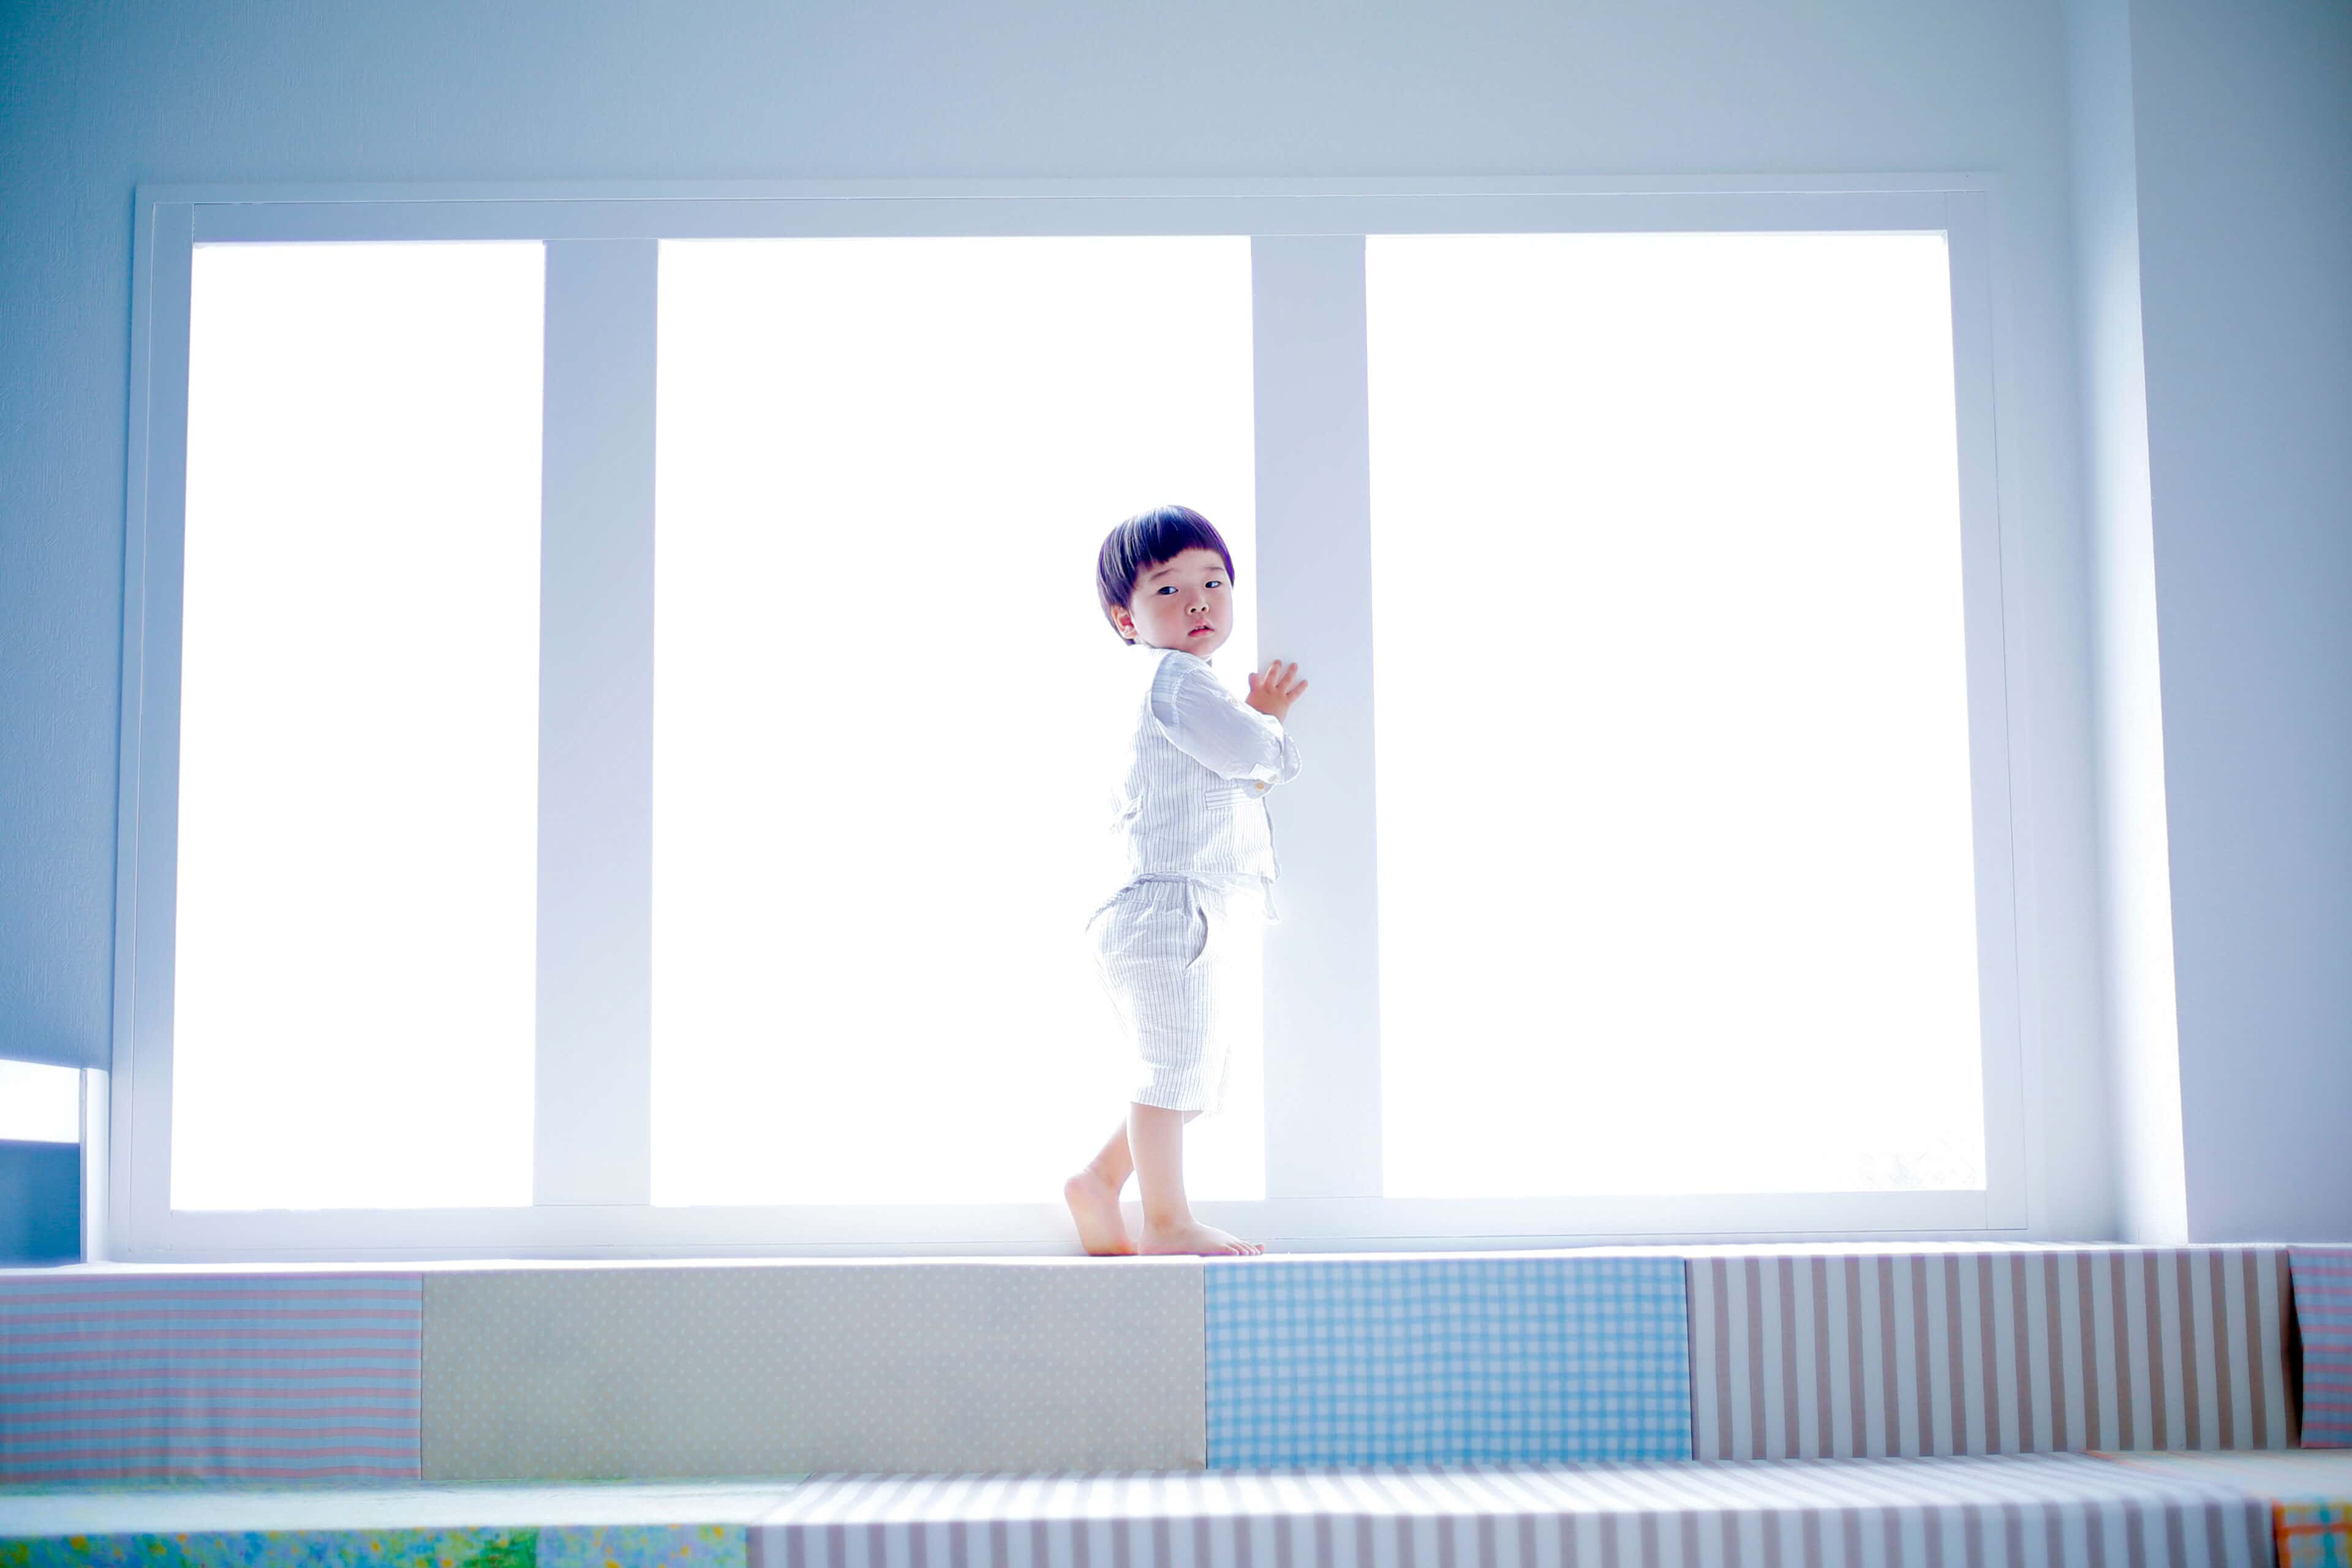 Coffret home|江戸川区フォトスタジオコフレホームkids8